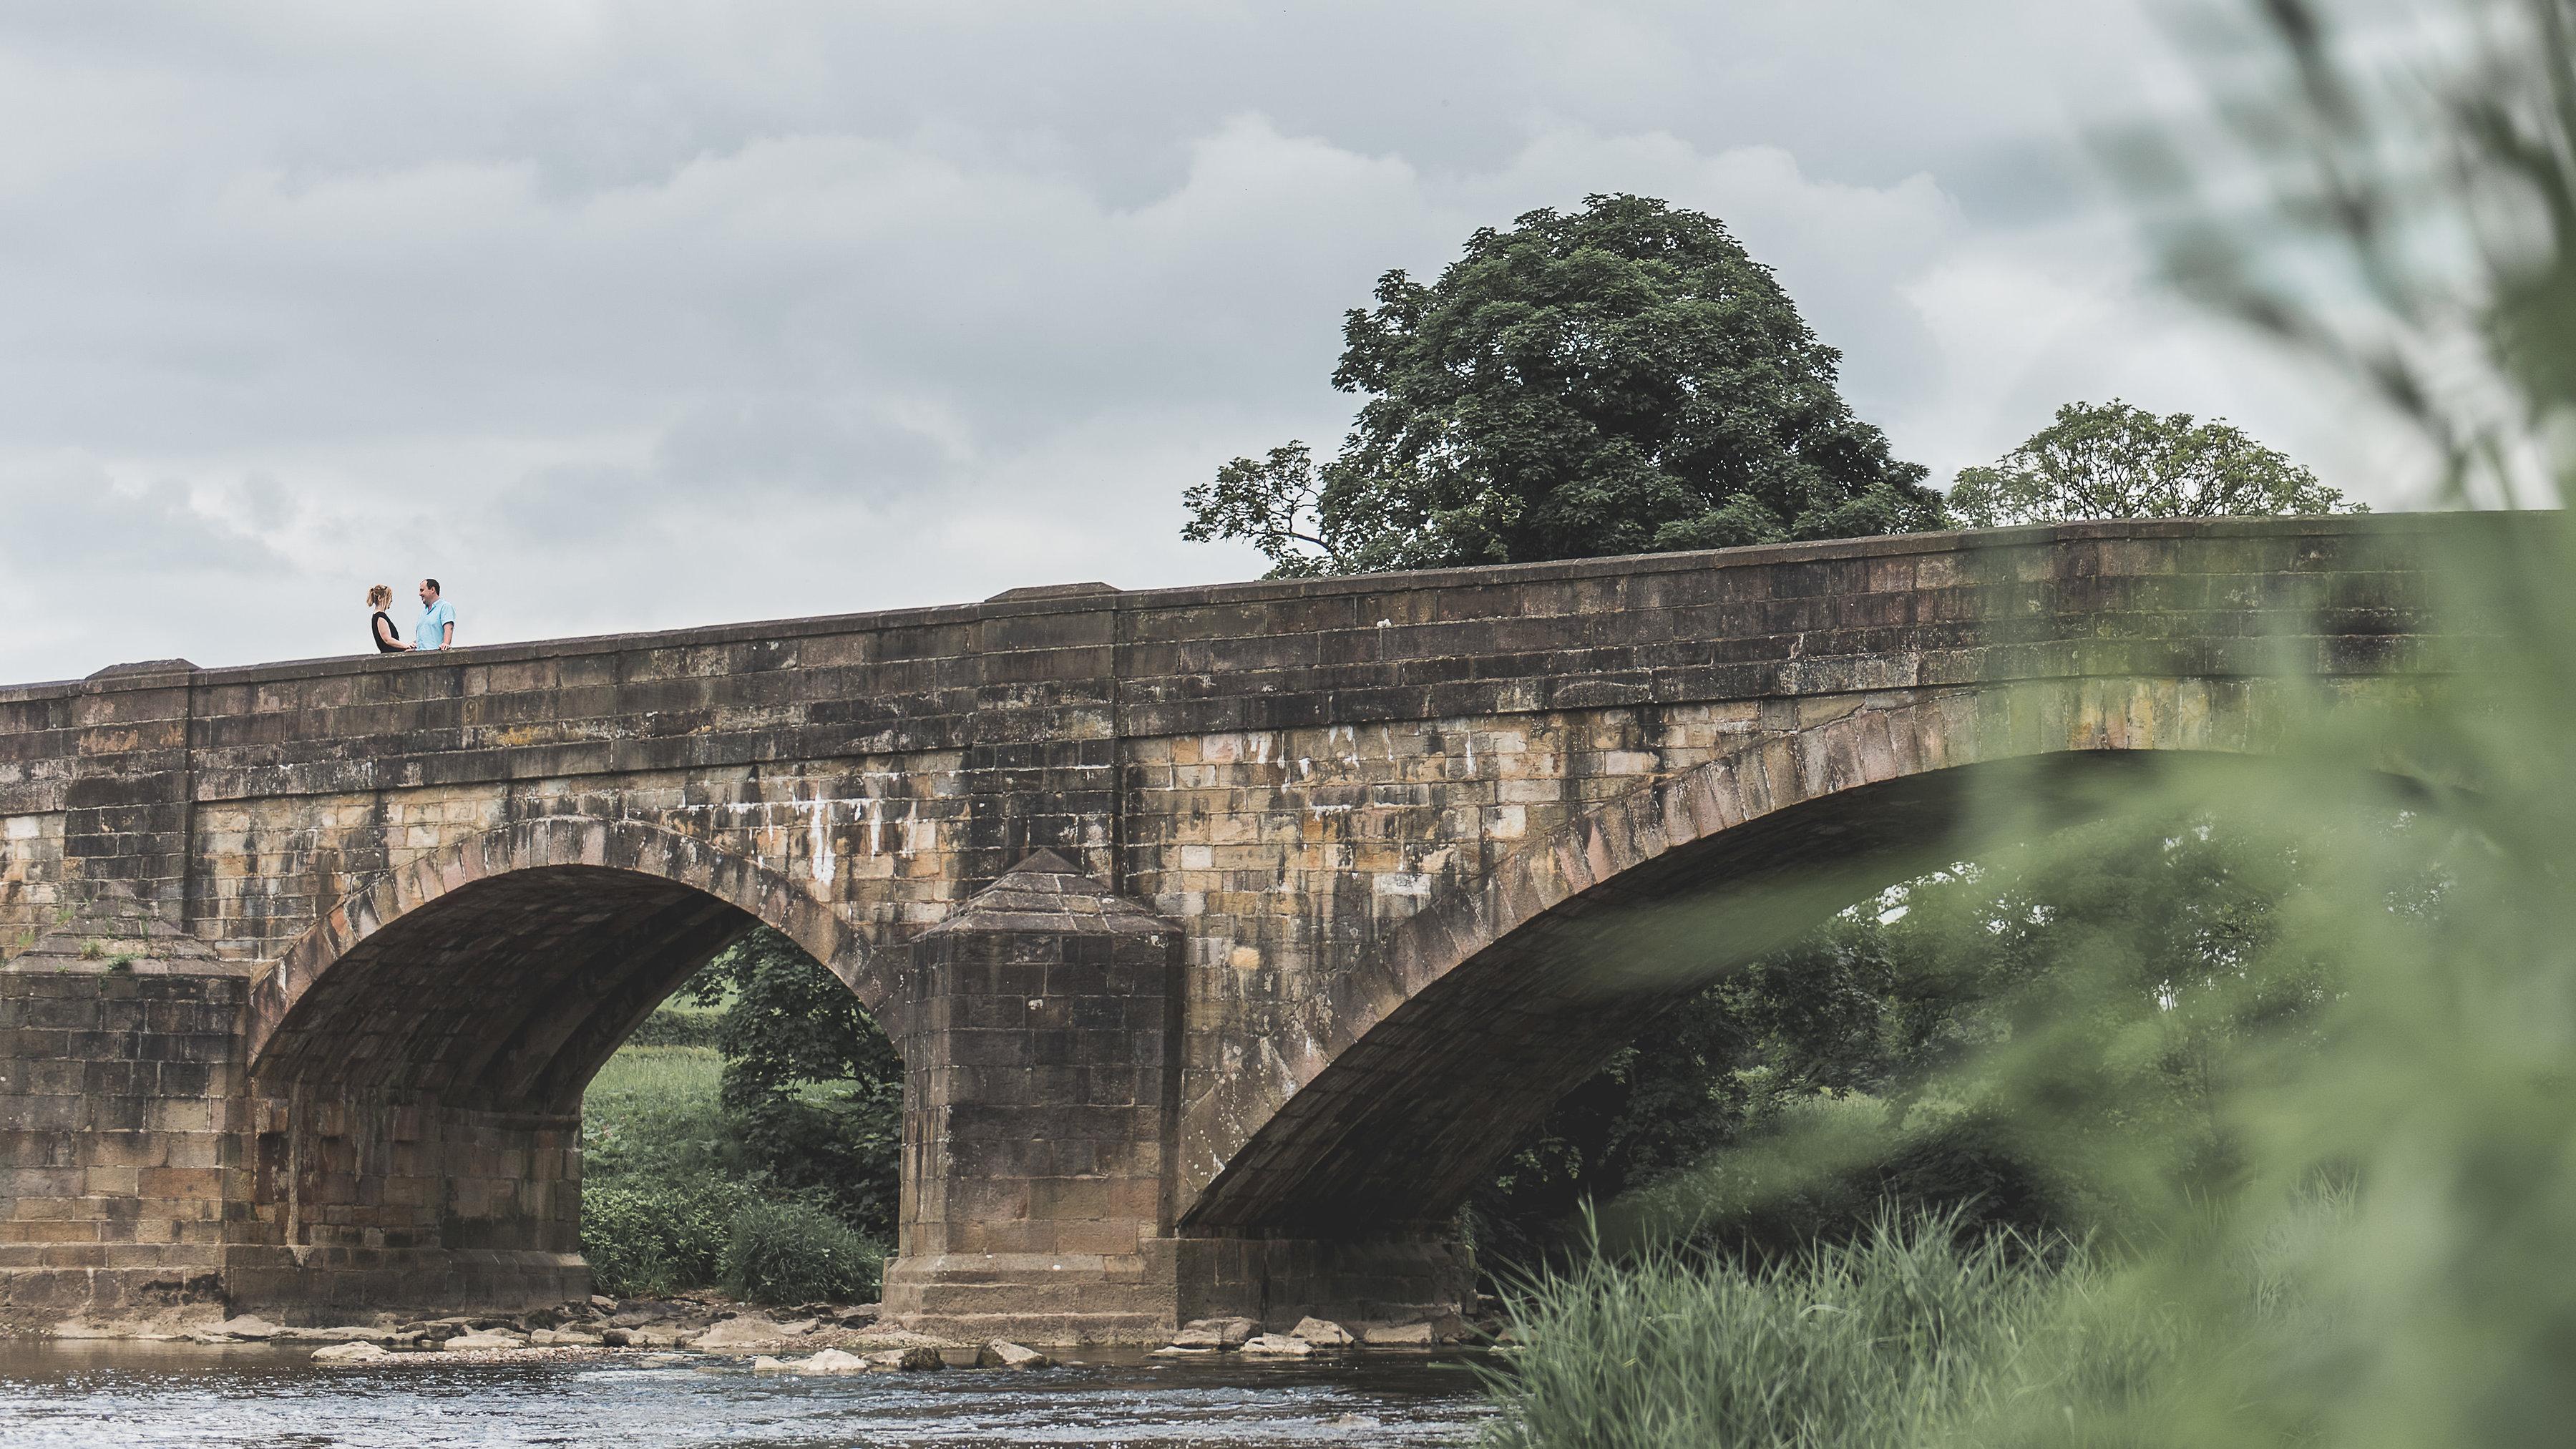 Edisford Bridge Engagement Shoot | Olivia & Tommy